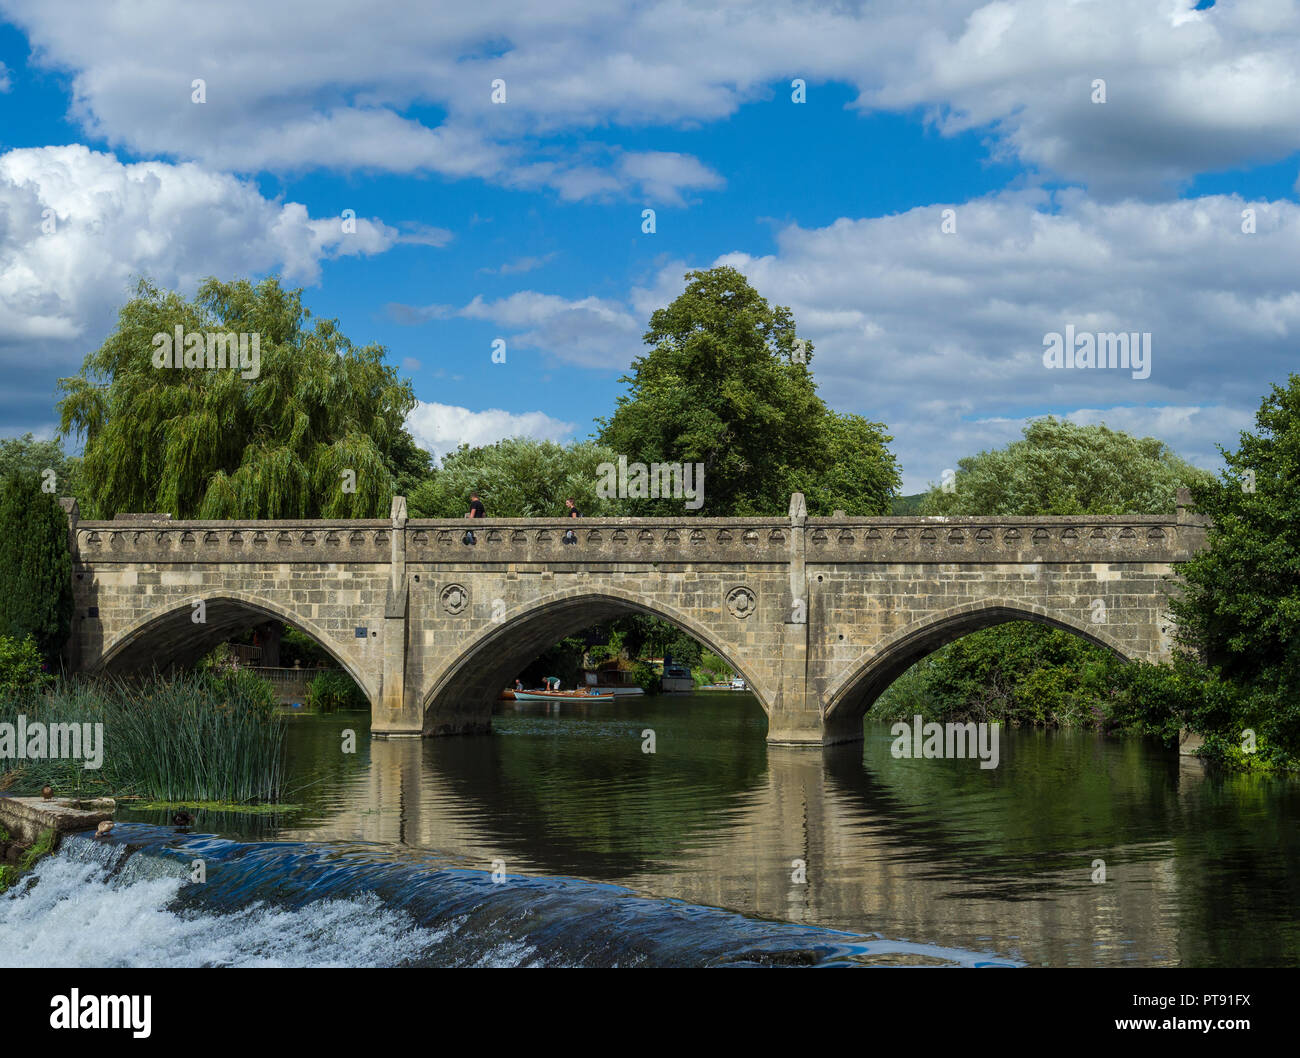 Batheaston toll bridge crossing the river Avon at Bathampton, Bath, Somerset, England, UK Stock Photo